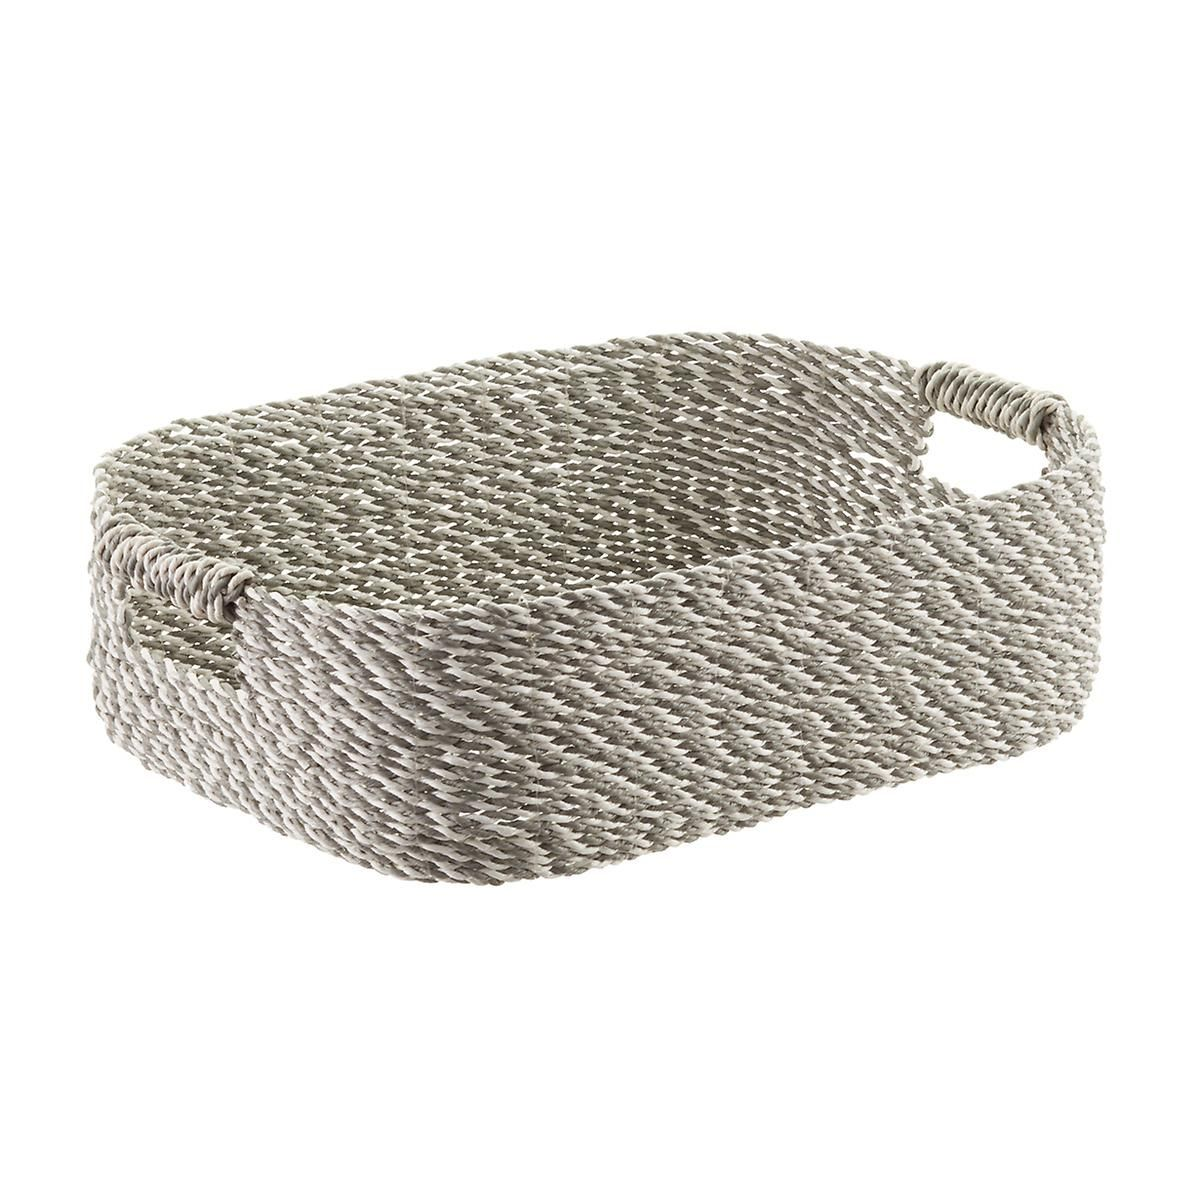 Superbe Grey U0026 White Decorative Raffia Storage Basket With Handles